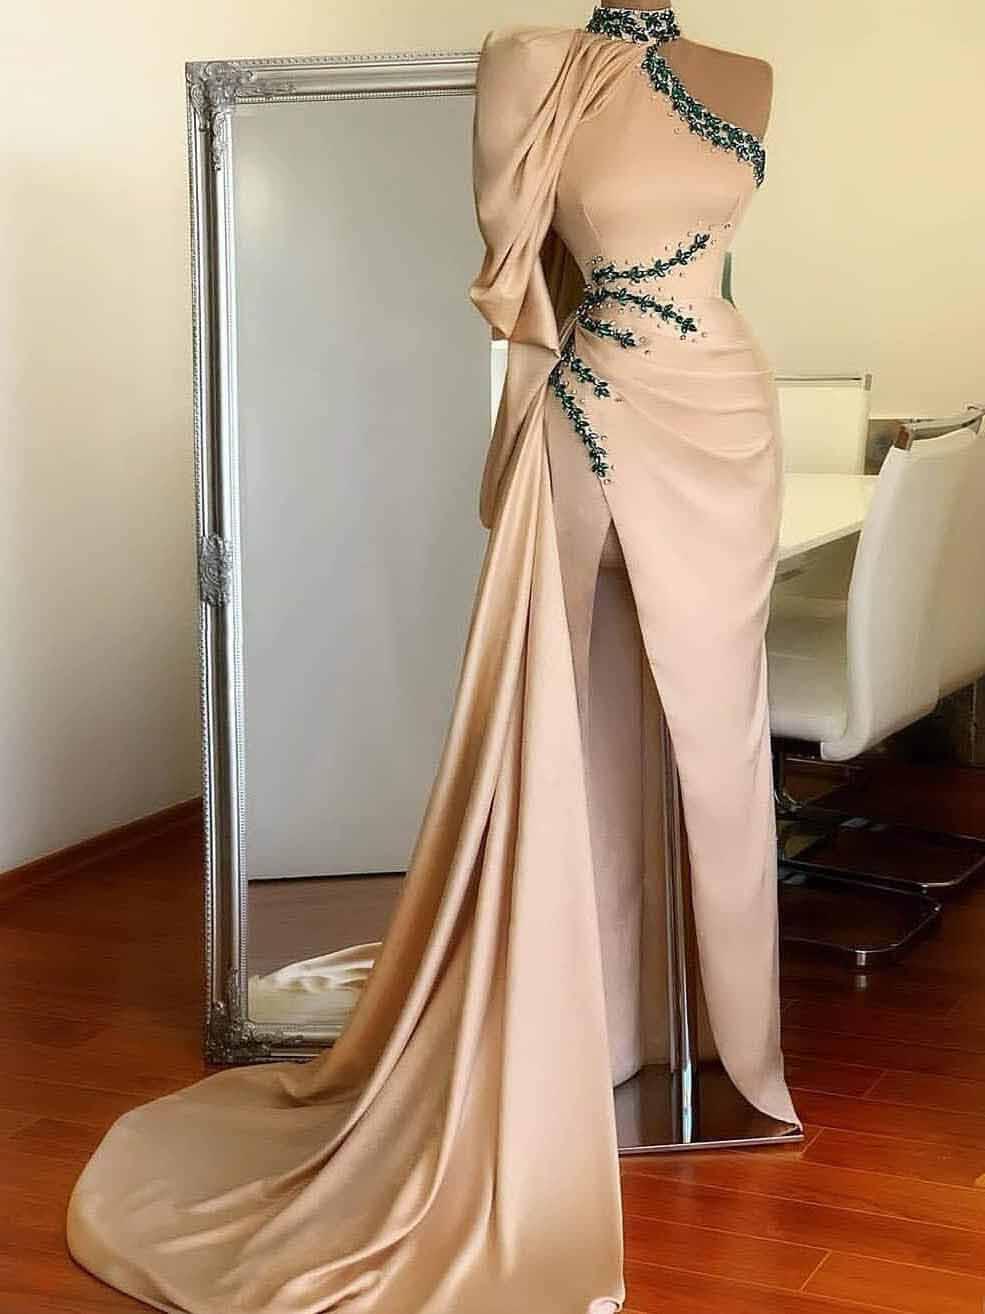 Fashion High Collar Beaded Ceystals Sheath High Slit Prom Dresses